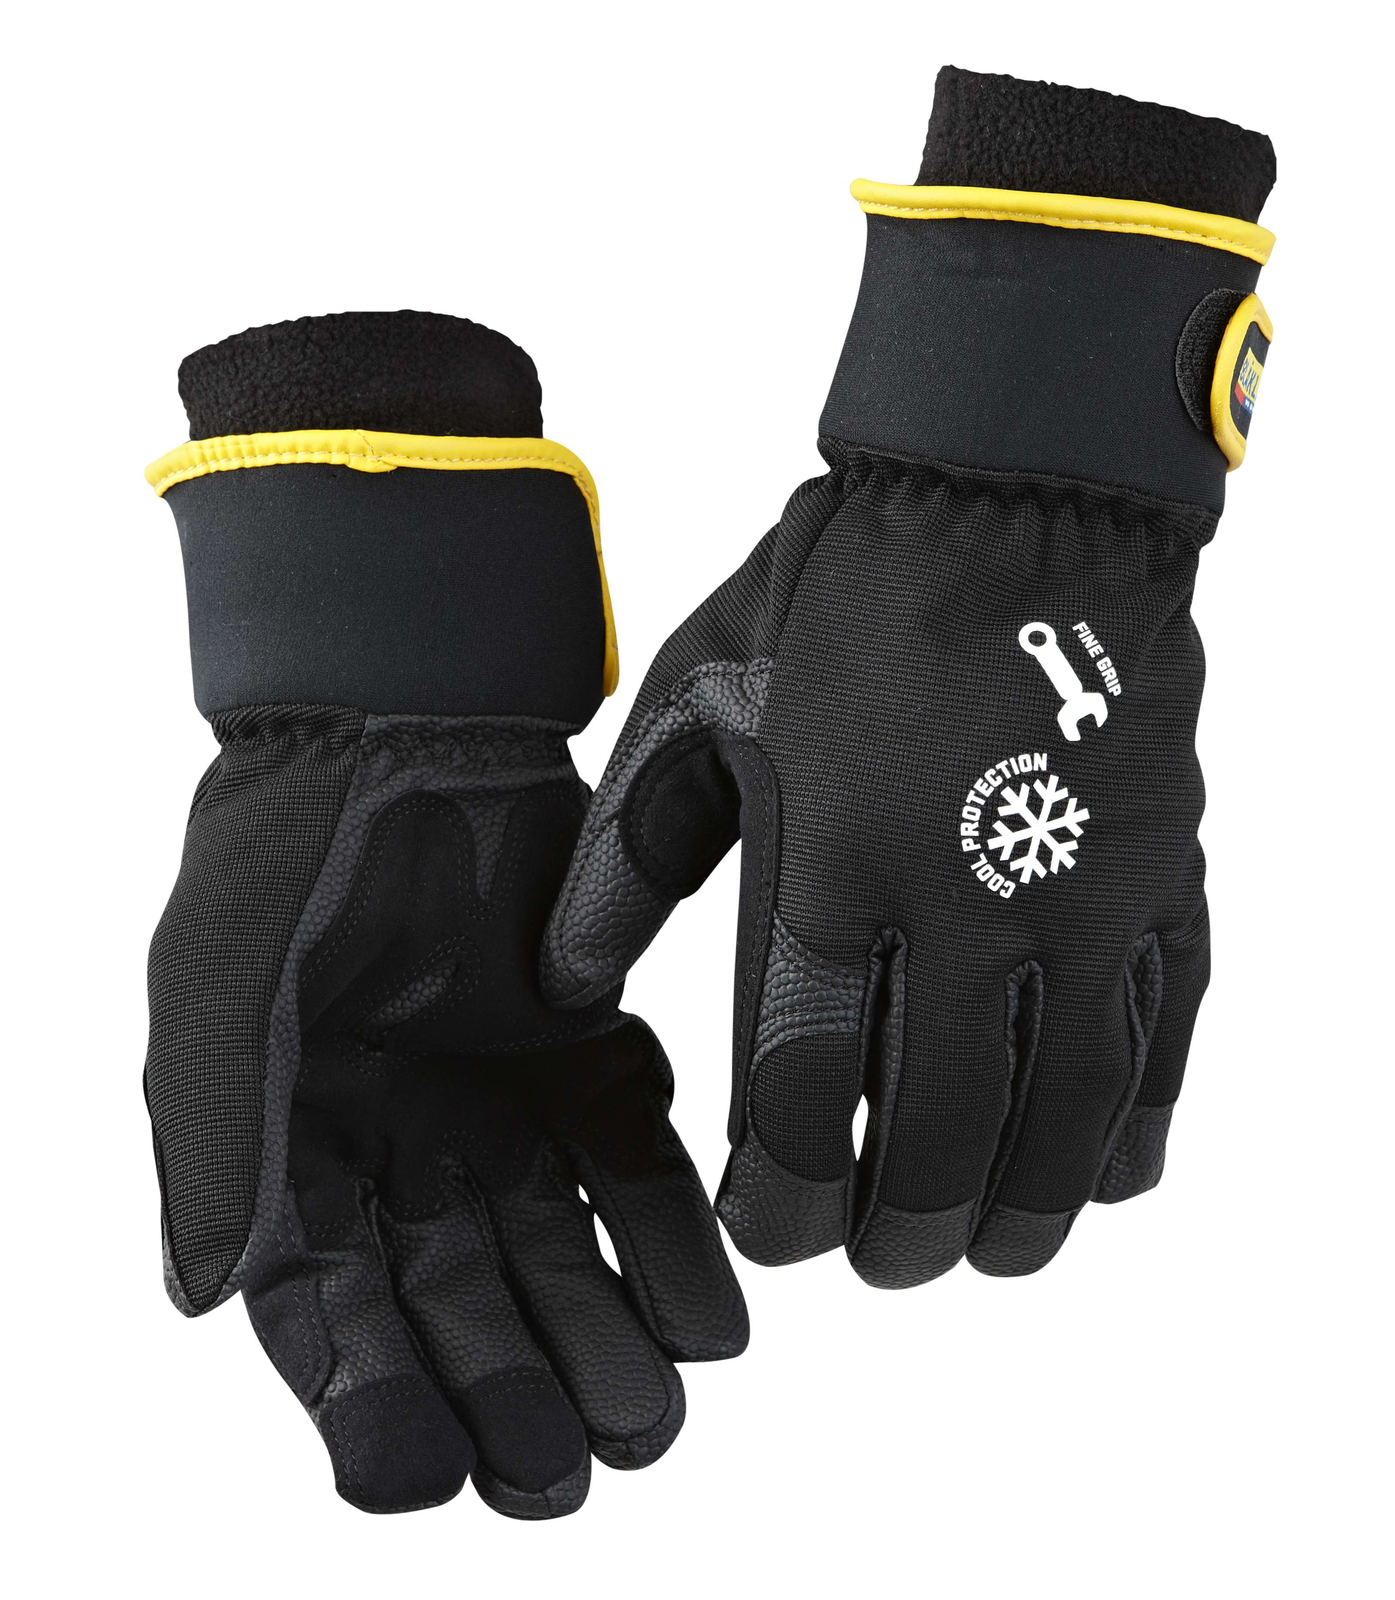 Blaklader Werkhandschoenen 22473944 zwart-grijs(9994)